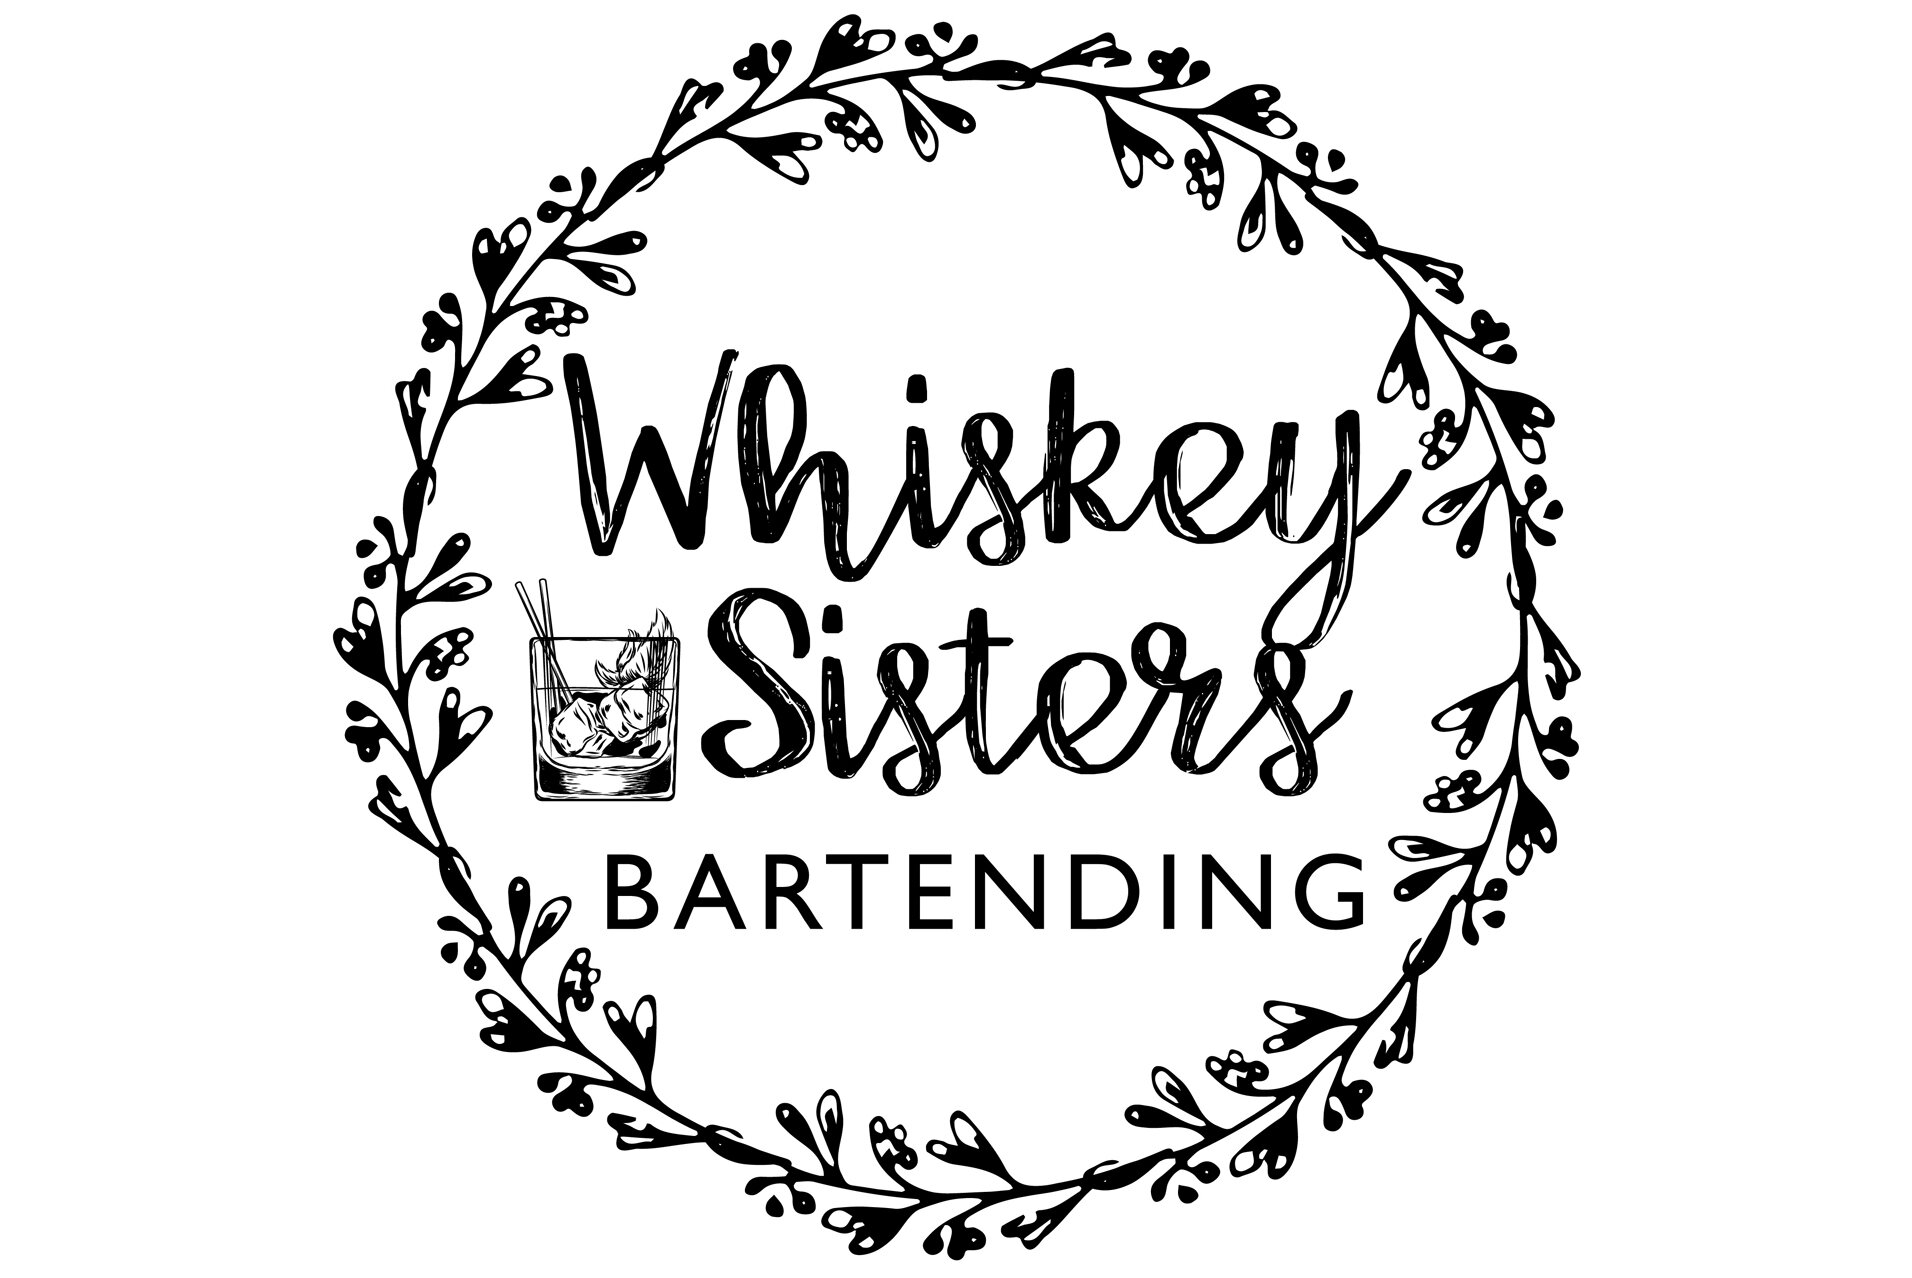 LogoWhiskeySisters bw 2019 outlined-01 web.jpg